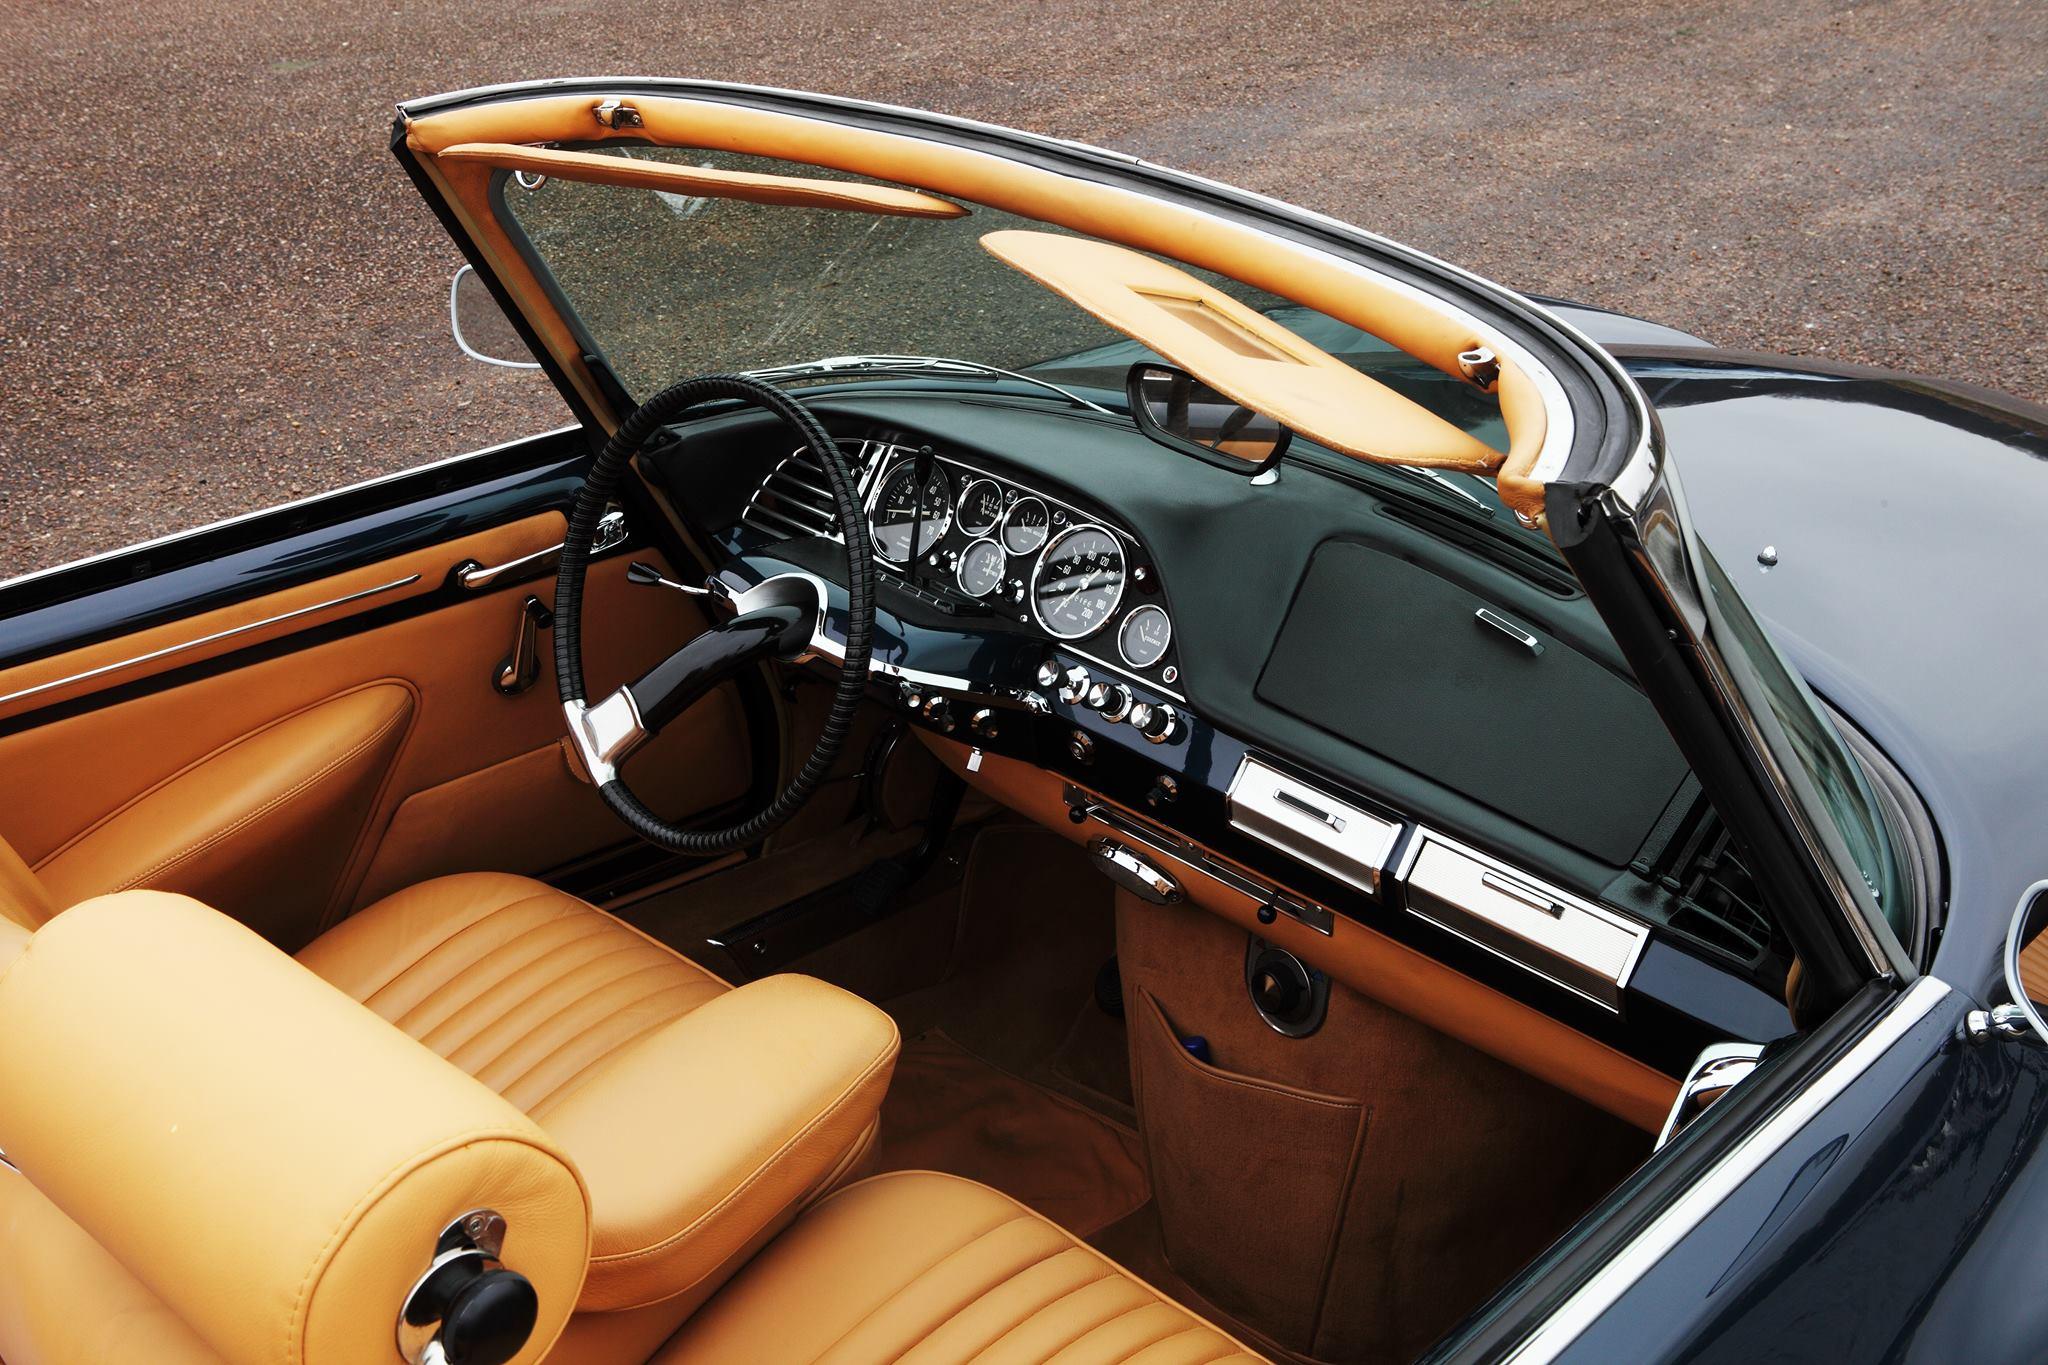 Citroen-DS21-cabriolet--1968-2